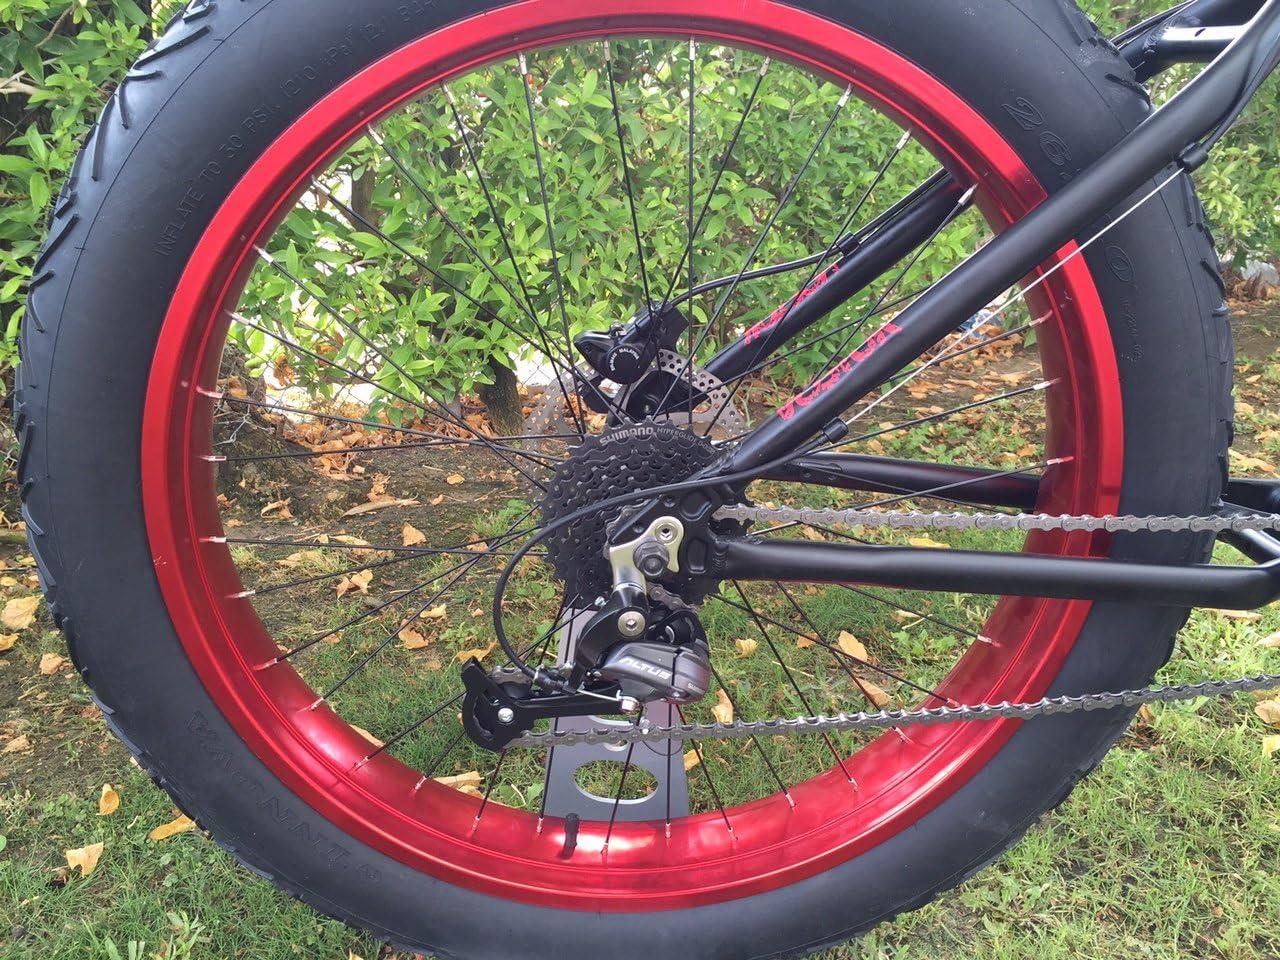 Berg Vostok Black Red Fatbike